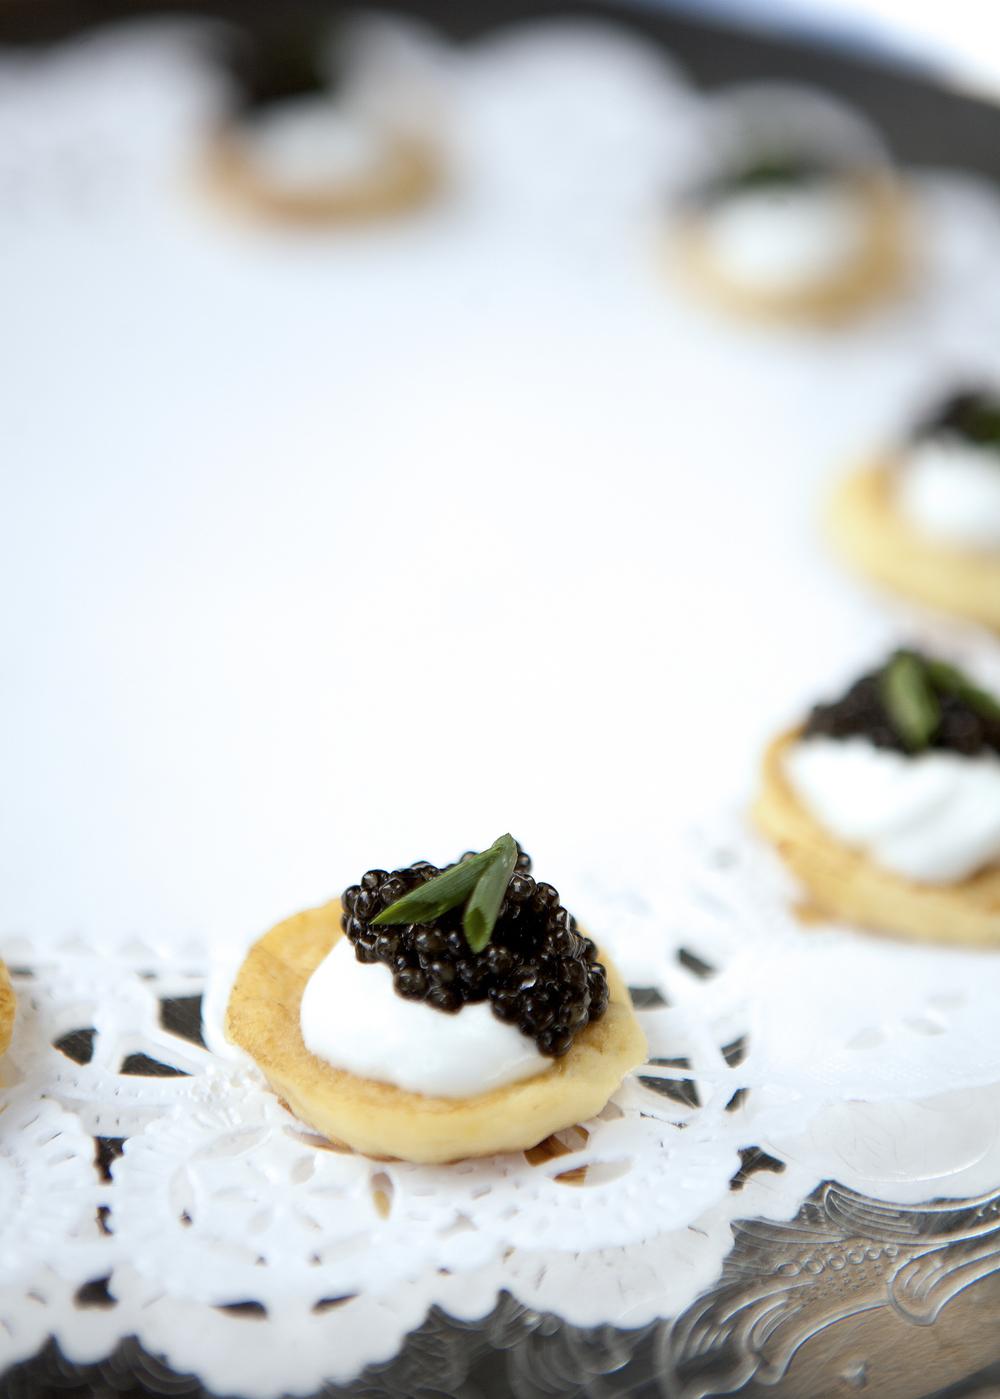 Caviar, creme fraiche, blini